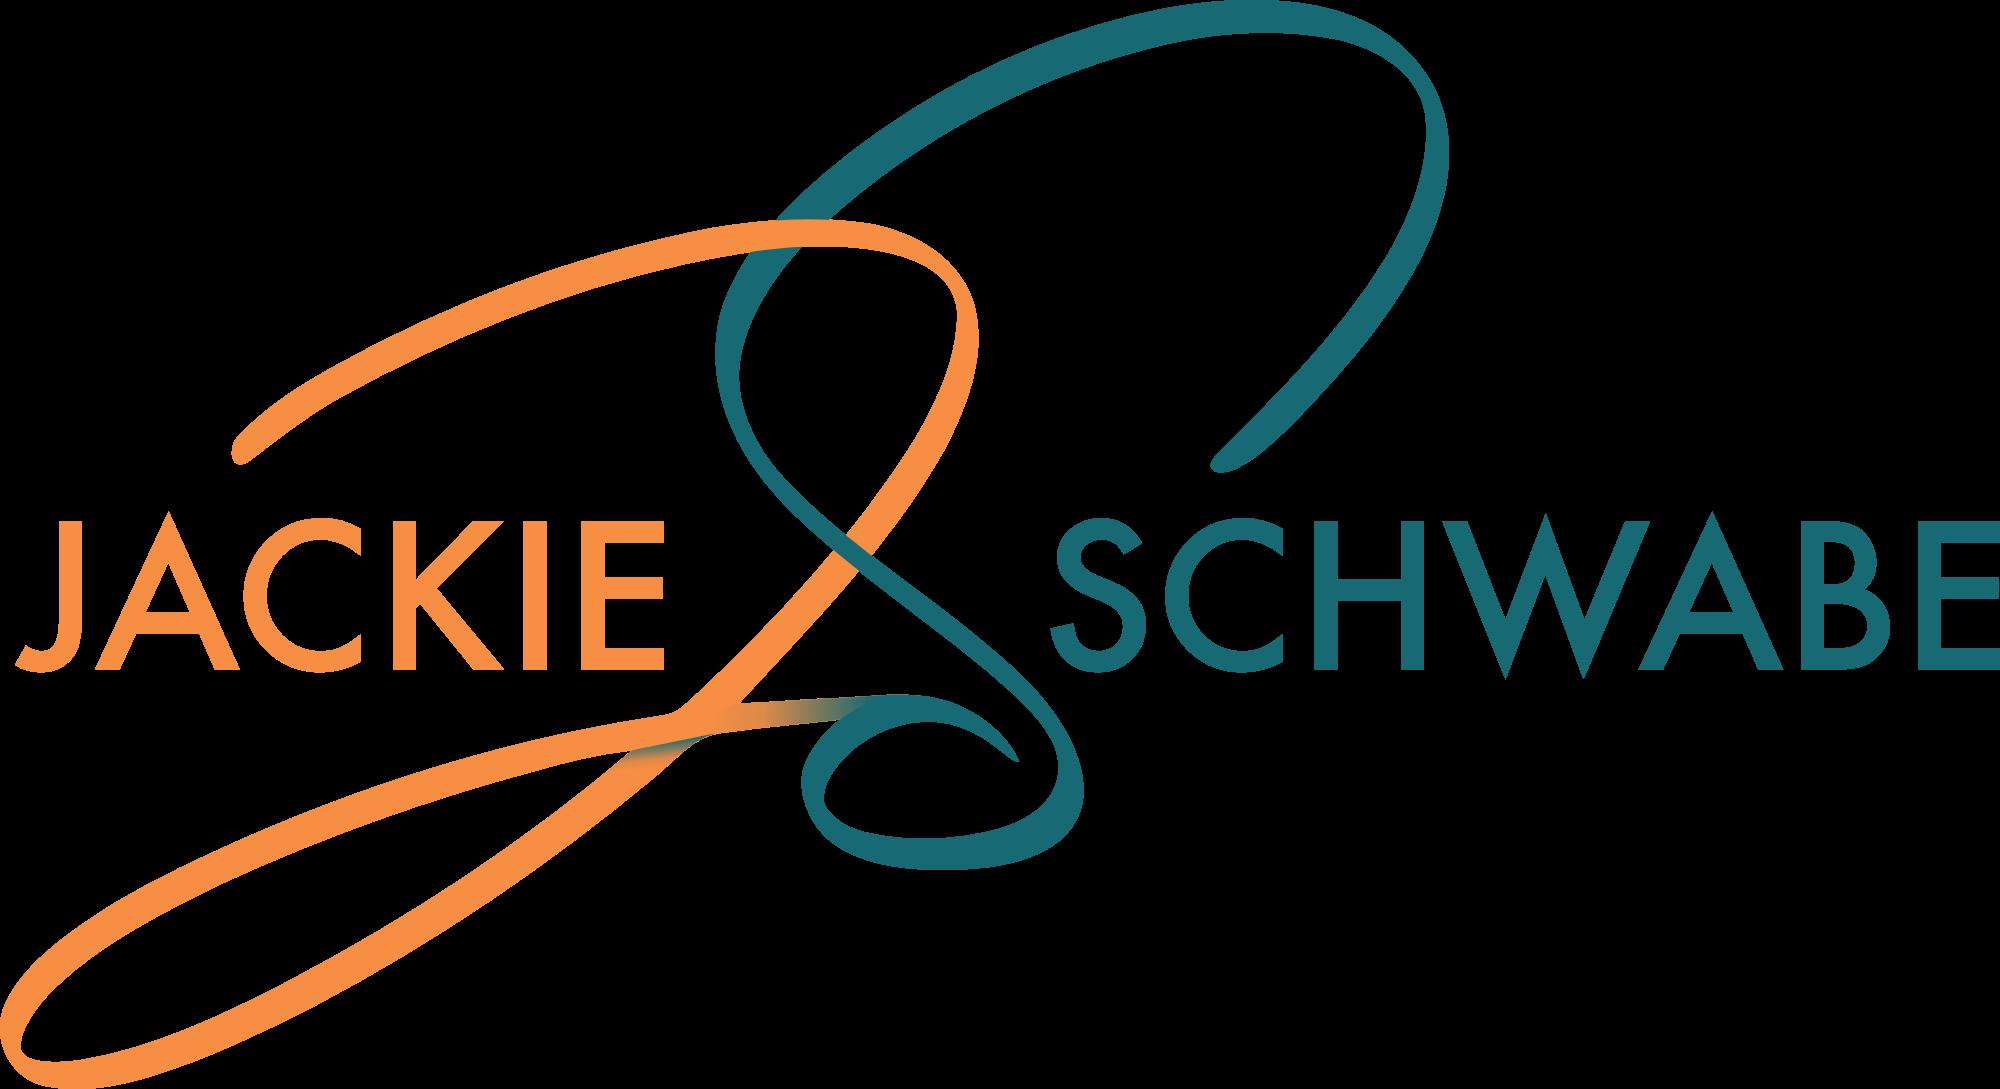 Jackie Schwabe Mark